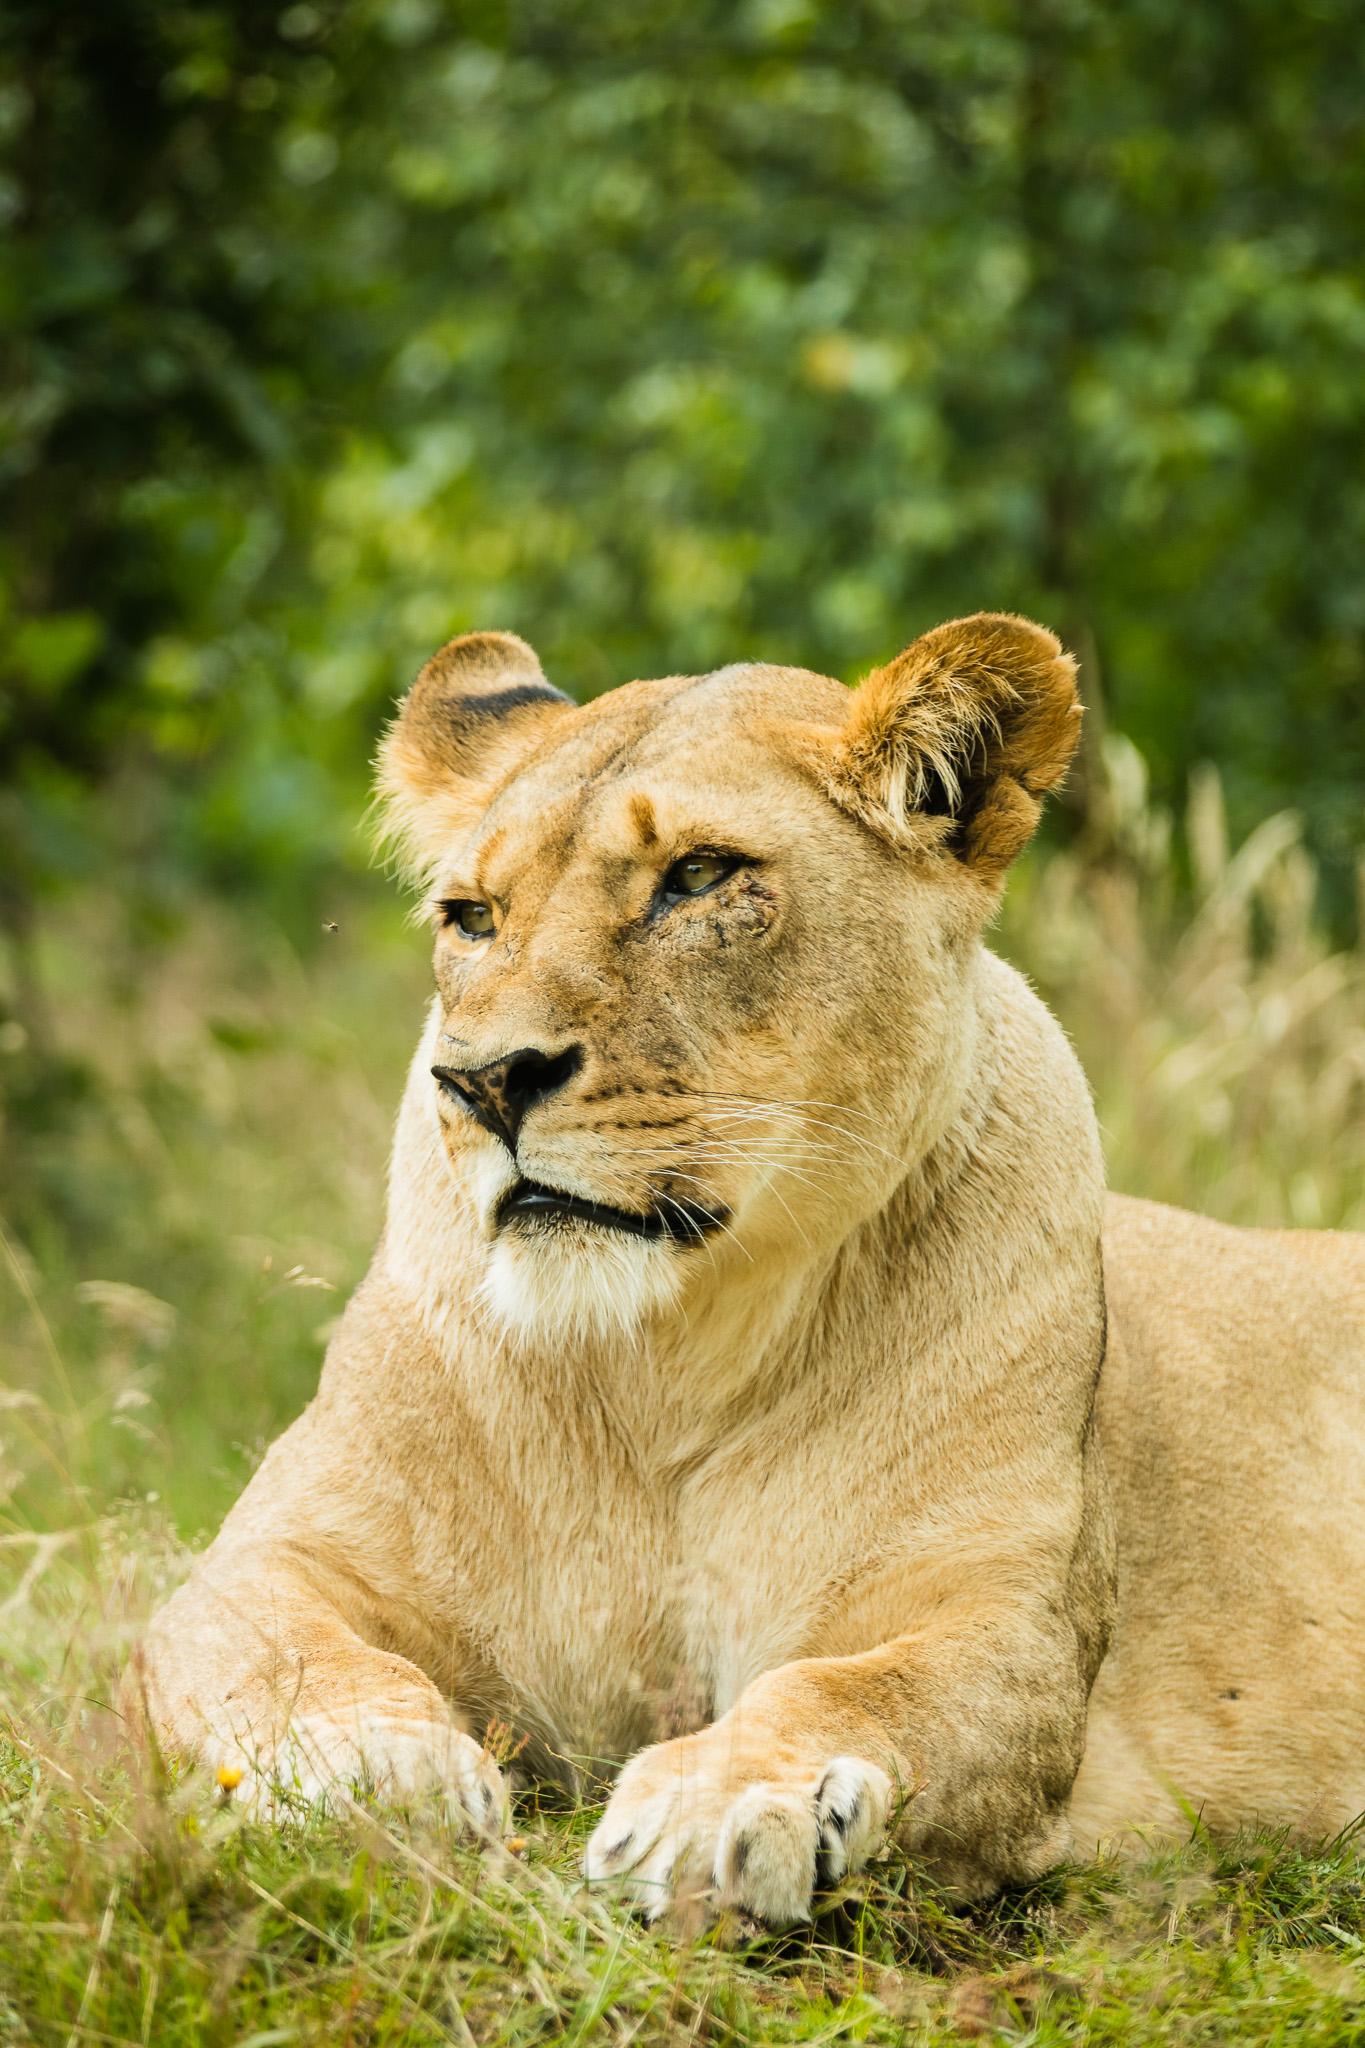 Givskud-Zoo-Safari-NorthernWorkshops-15.jpg